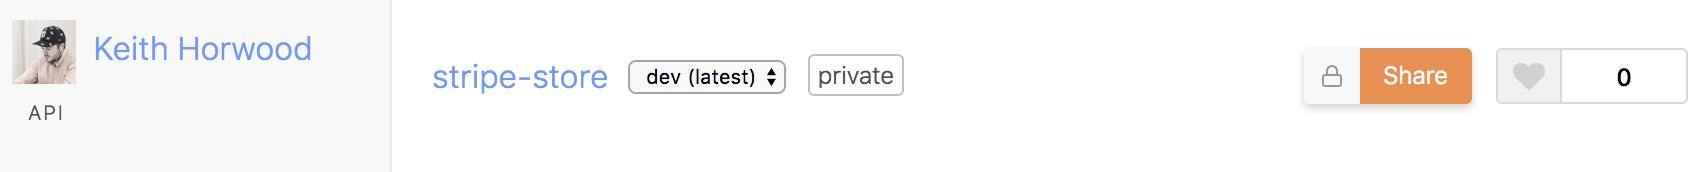 Share APIs